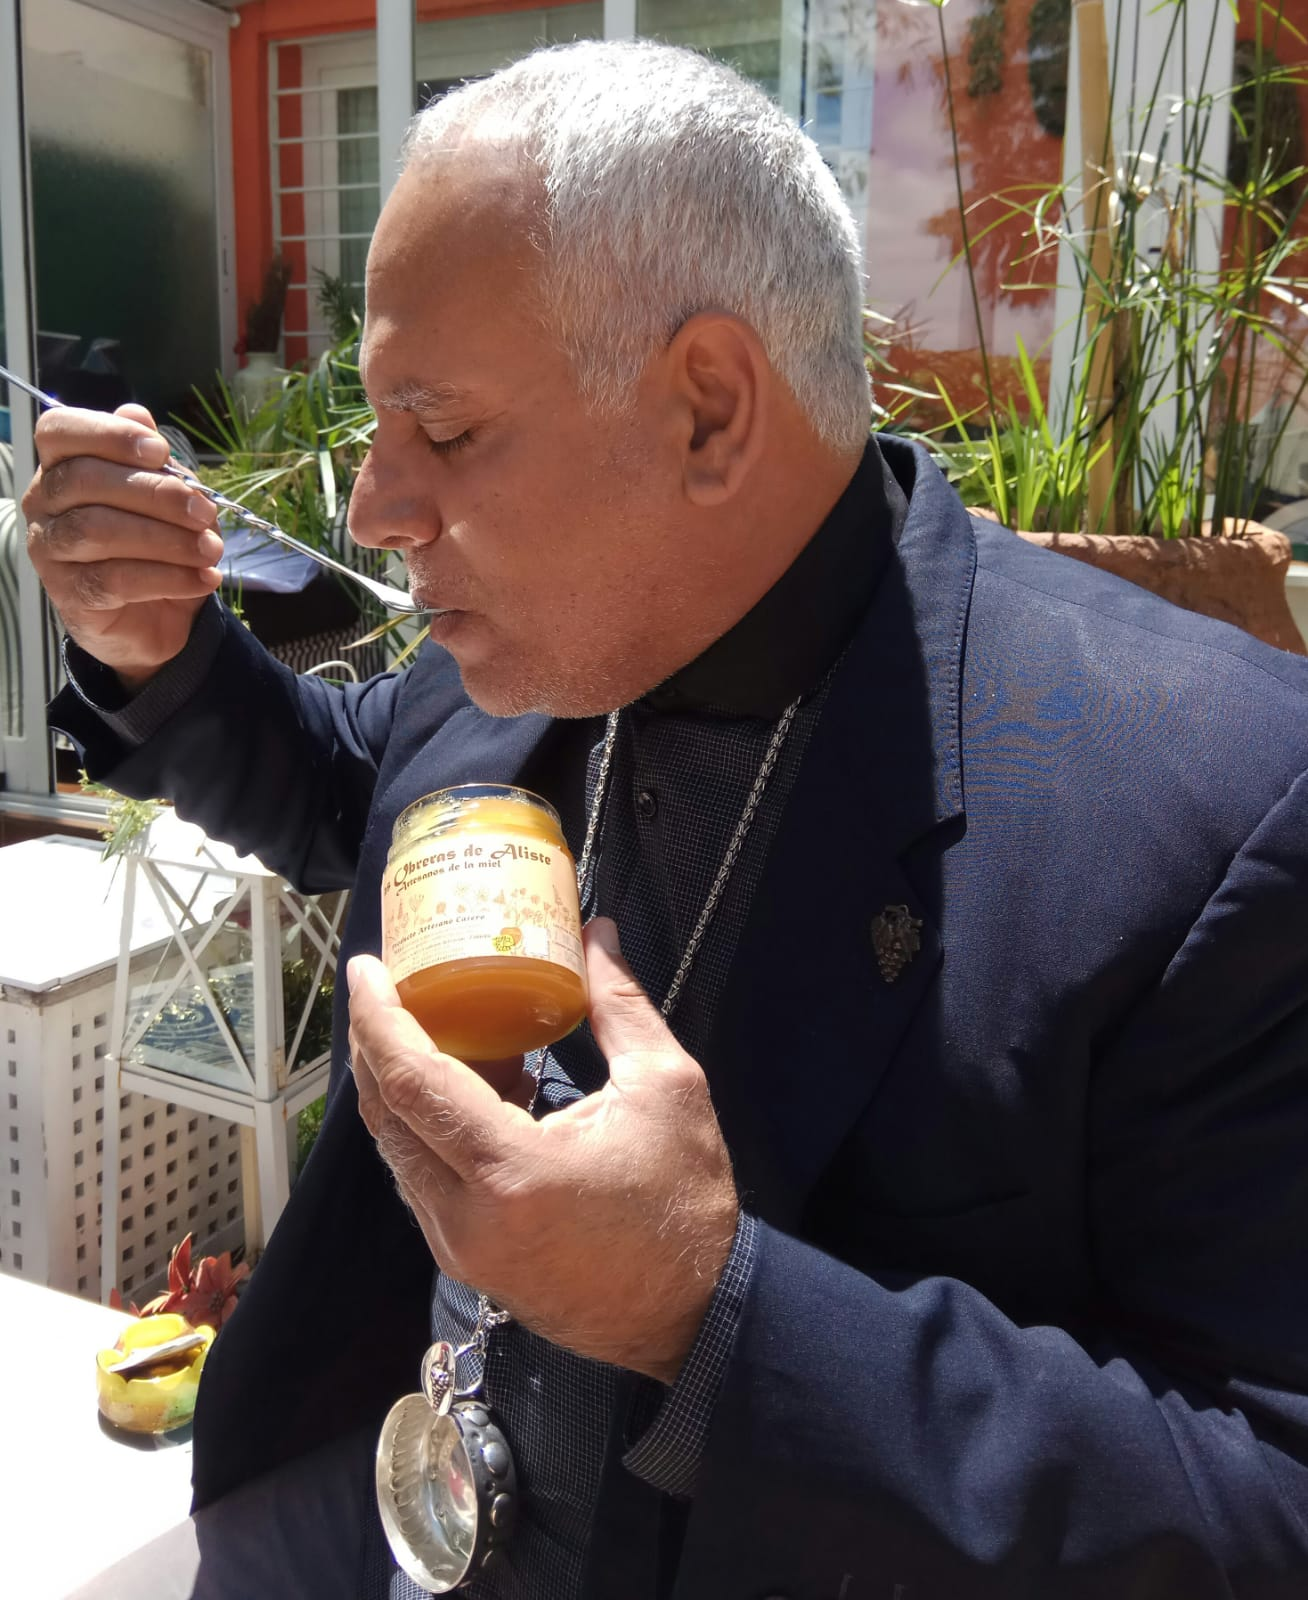 sumiller Rigoberto Carceller Las Obreras de Aliste miel artesana